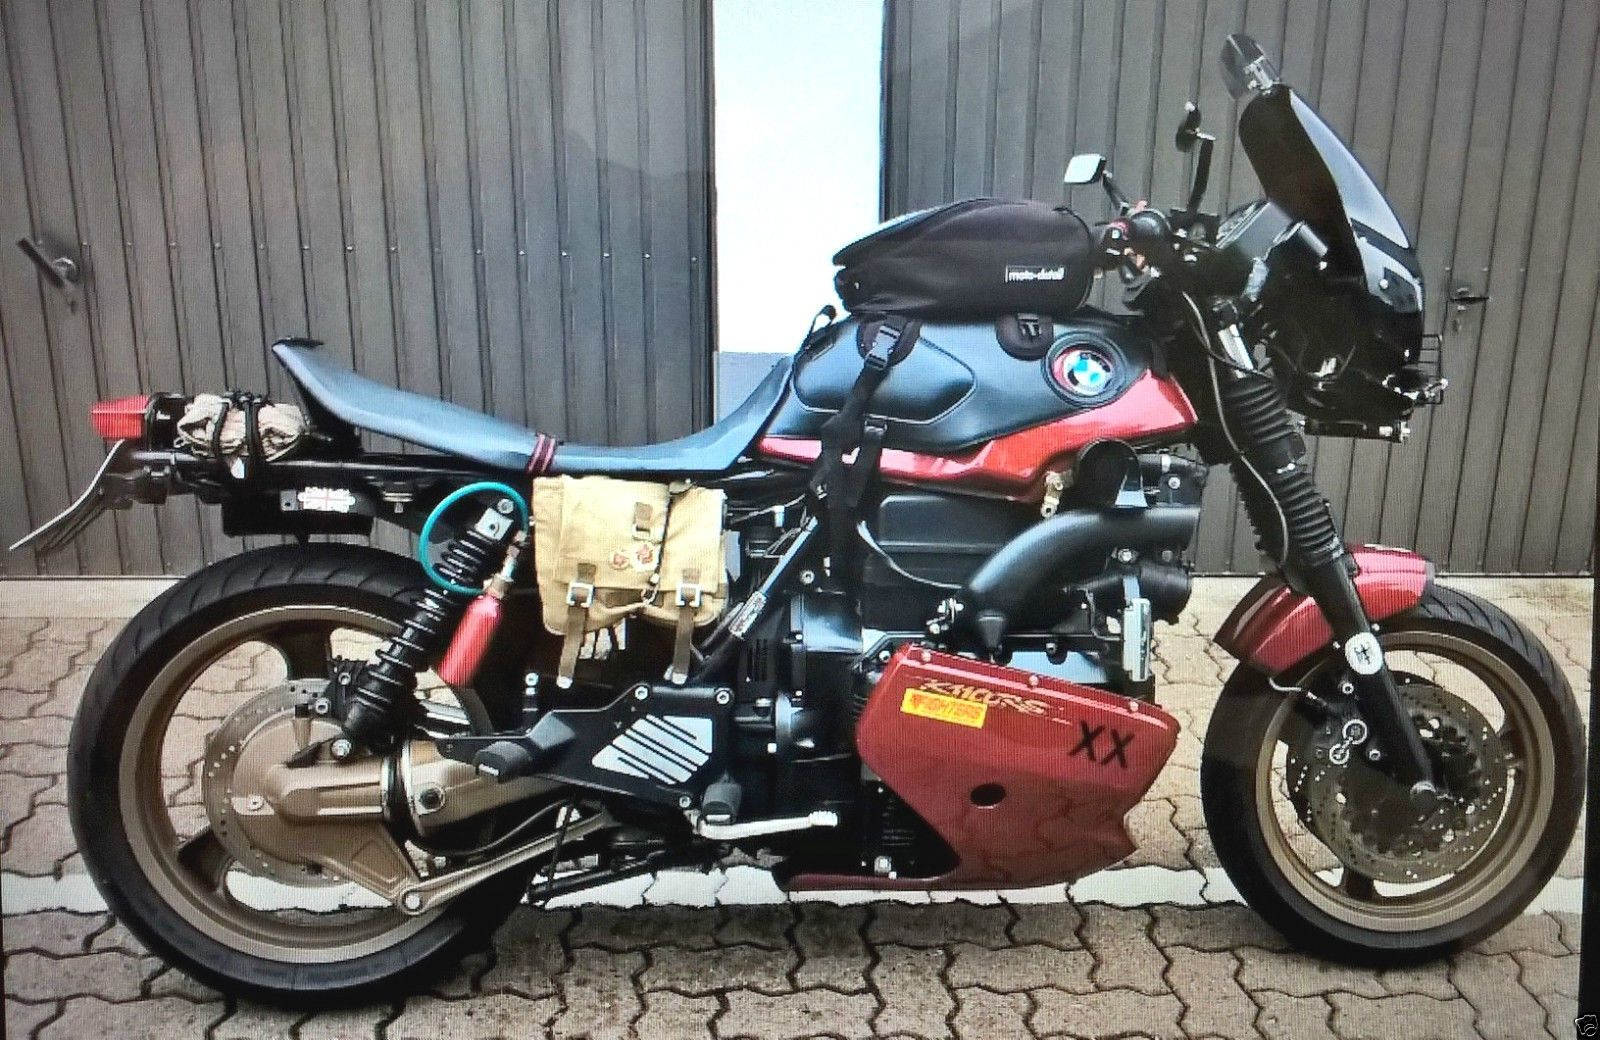 BMW K 1100 RS Custom Bike Umbau Racer Scrambler Bratstyle In Auto Motorrad